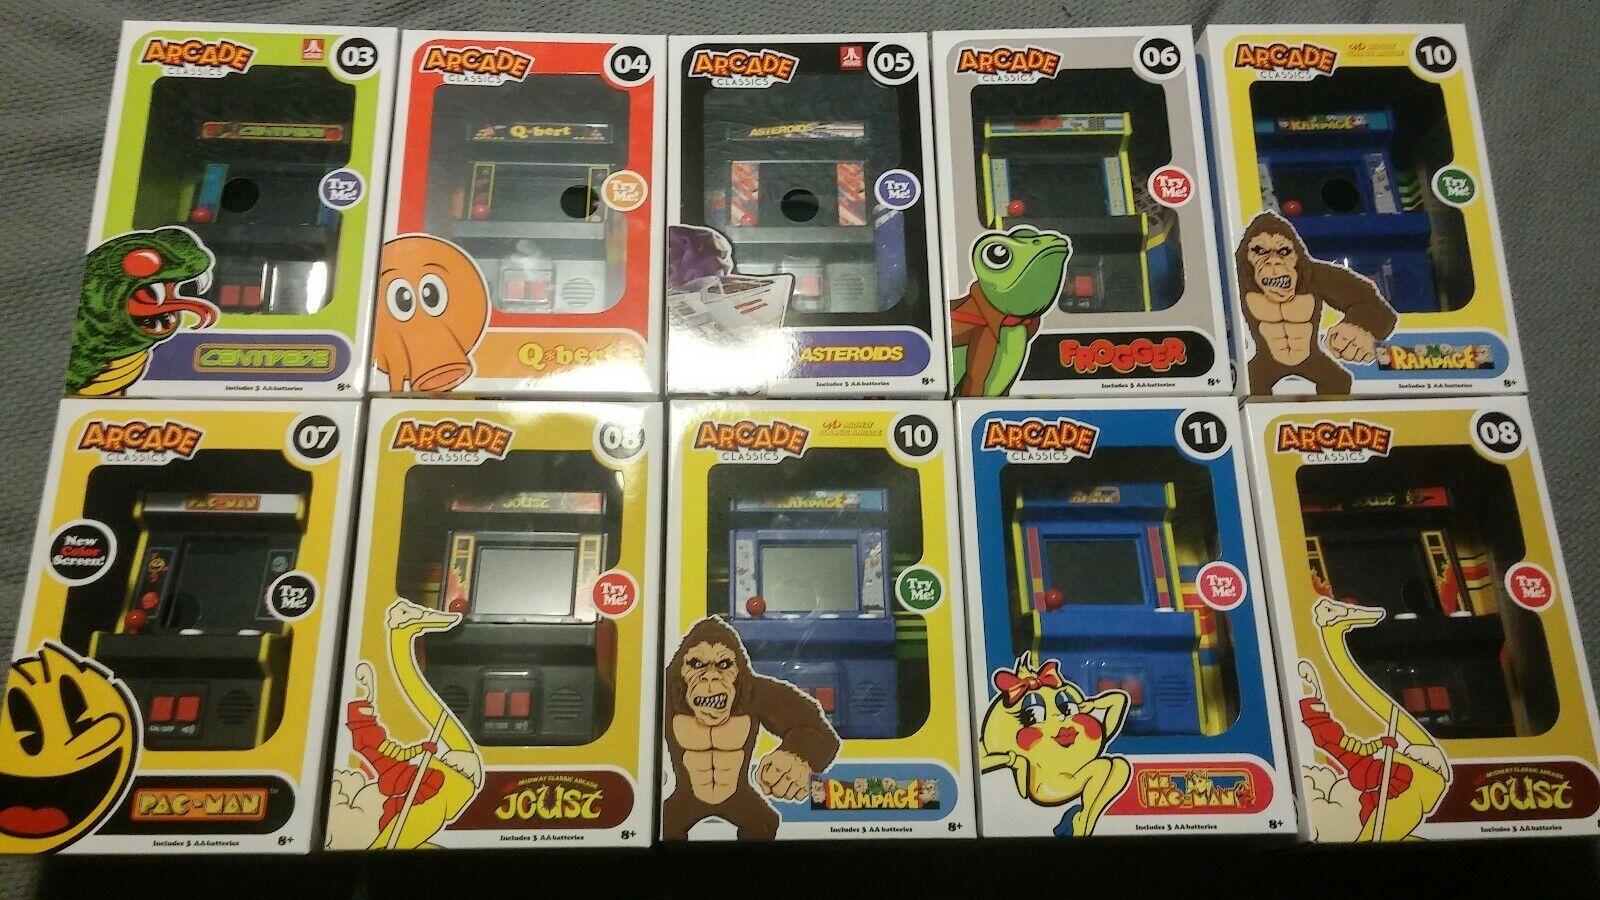 Brand New Mini Arcade Arcade Arcade Classics 10 Games Rampage Joust Ms. PacMan Qbert Frogger acf01b